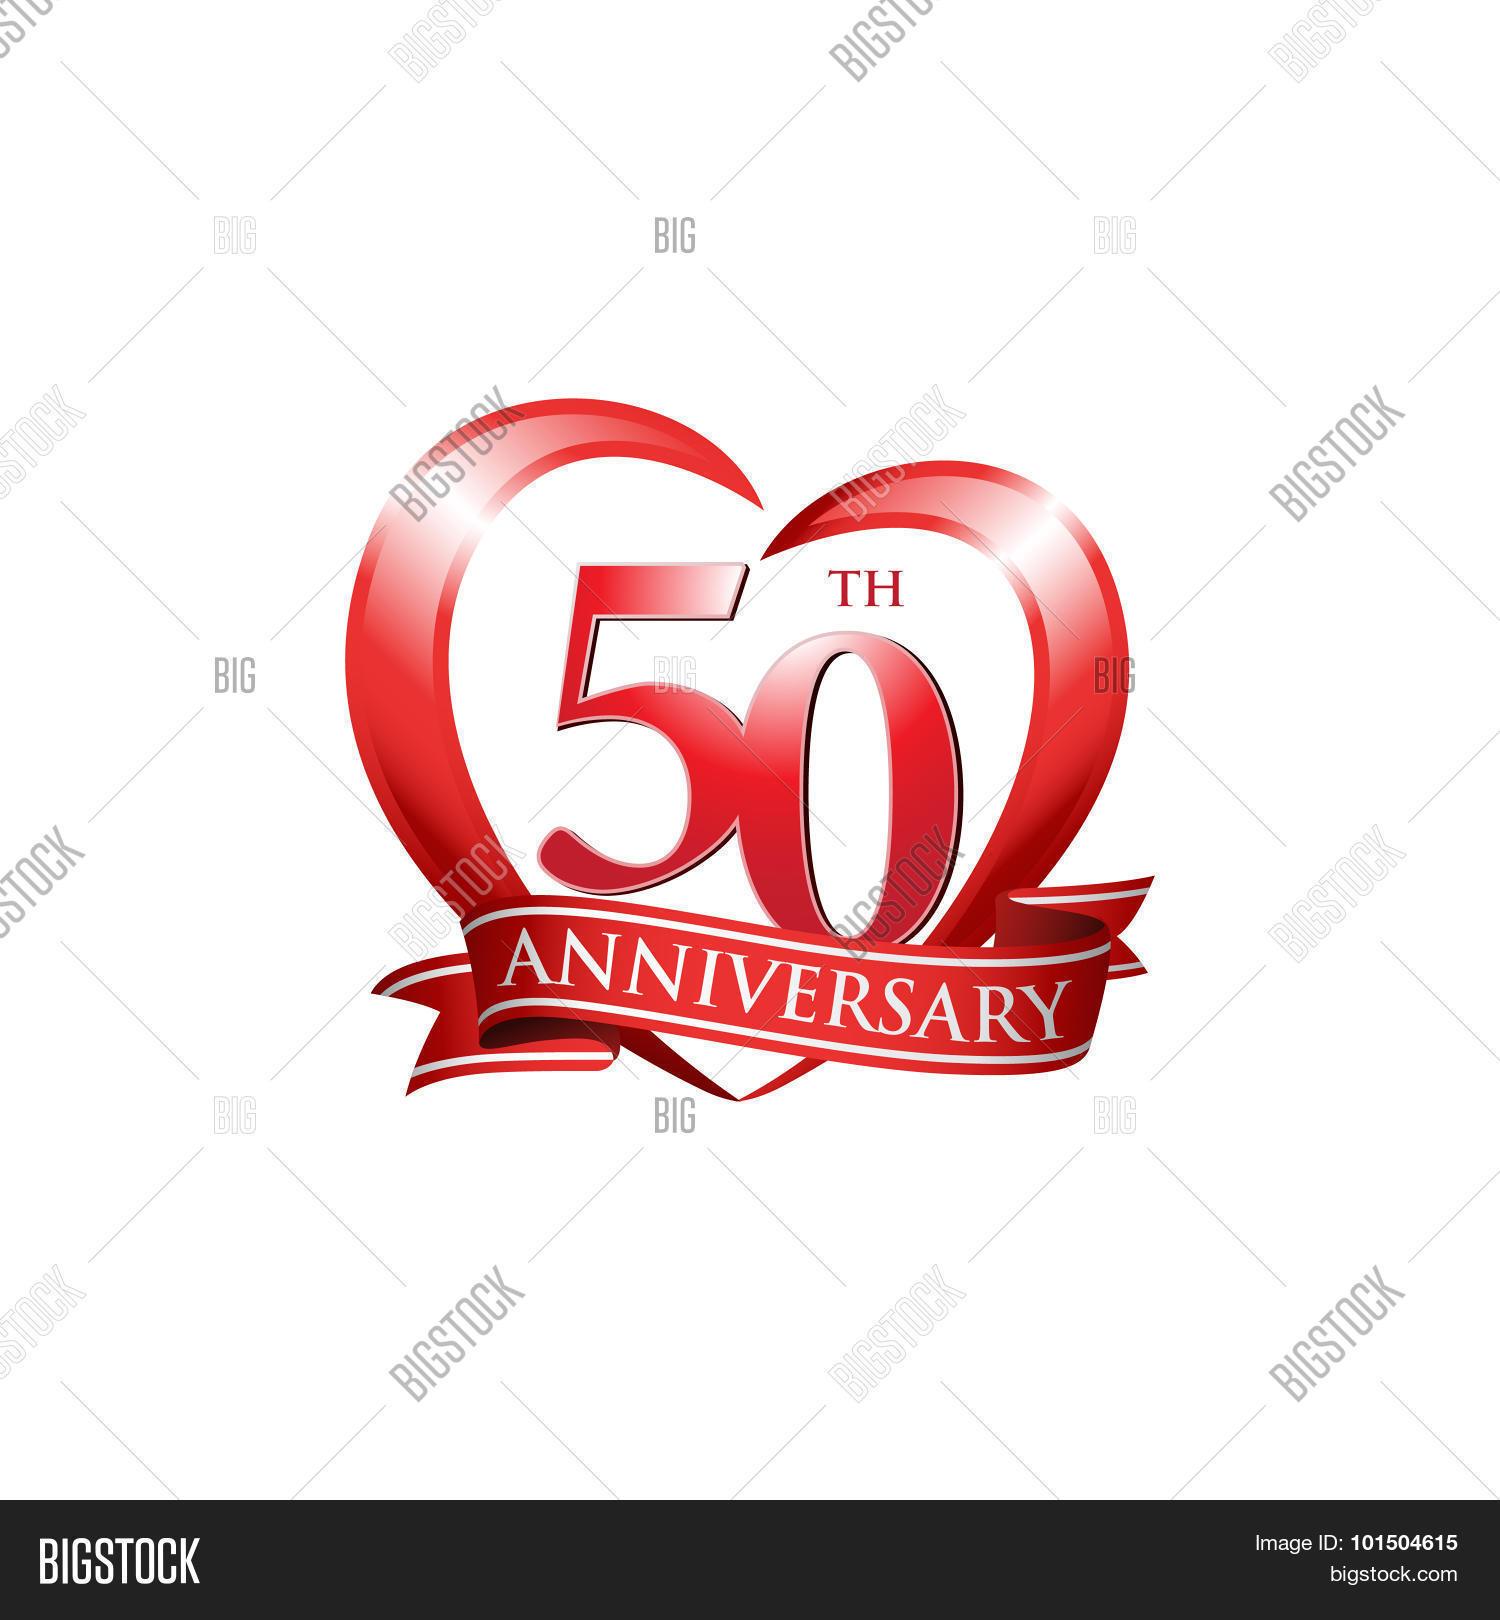 50th Anniversary Logo Vector & Photo (Free Trial) | Bigstock